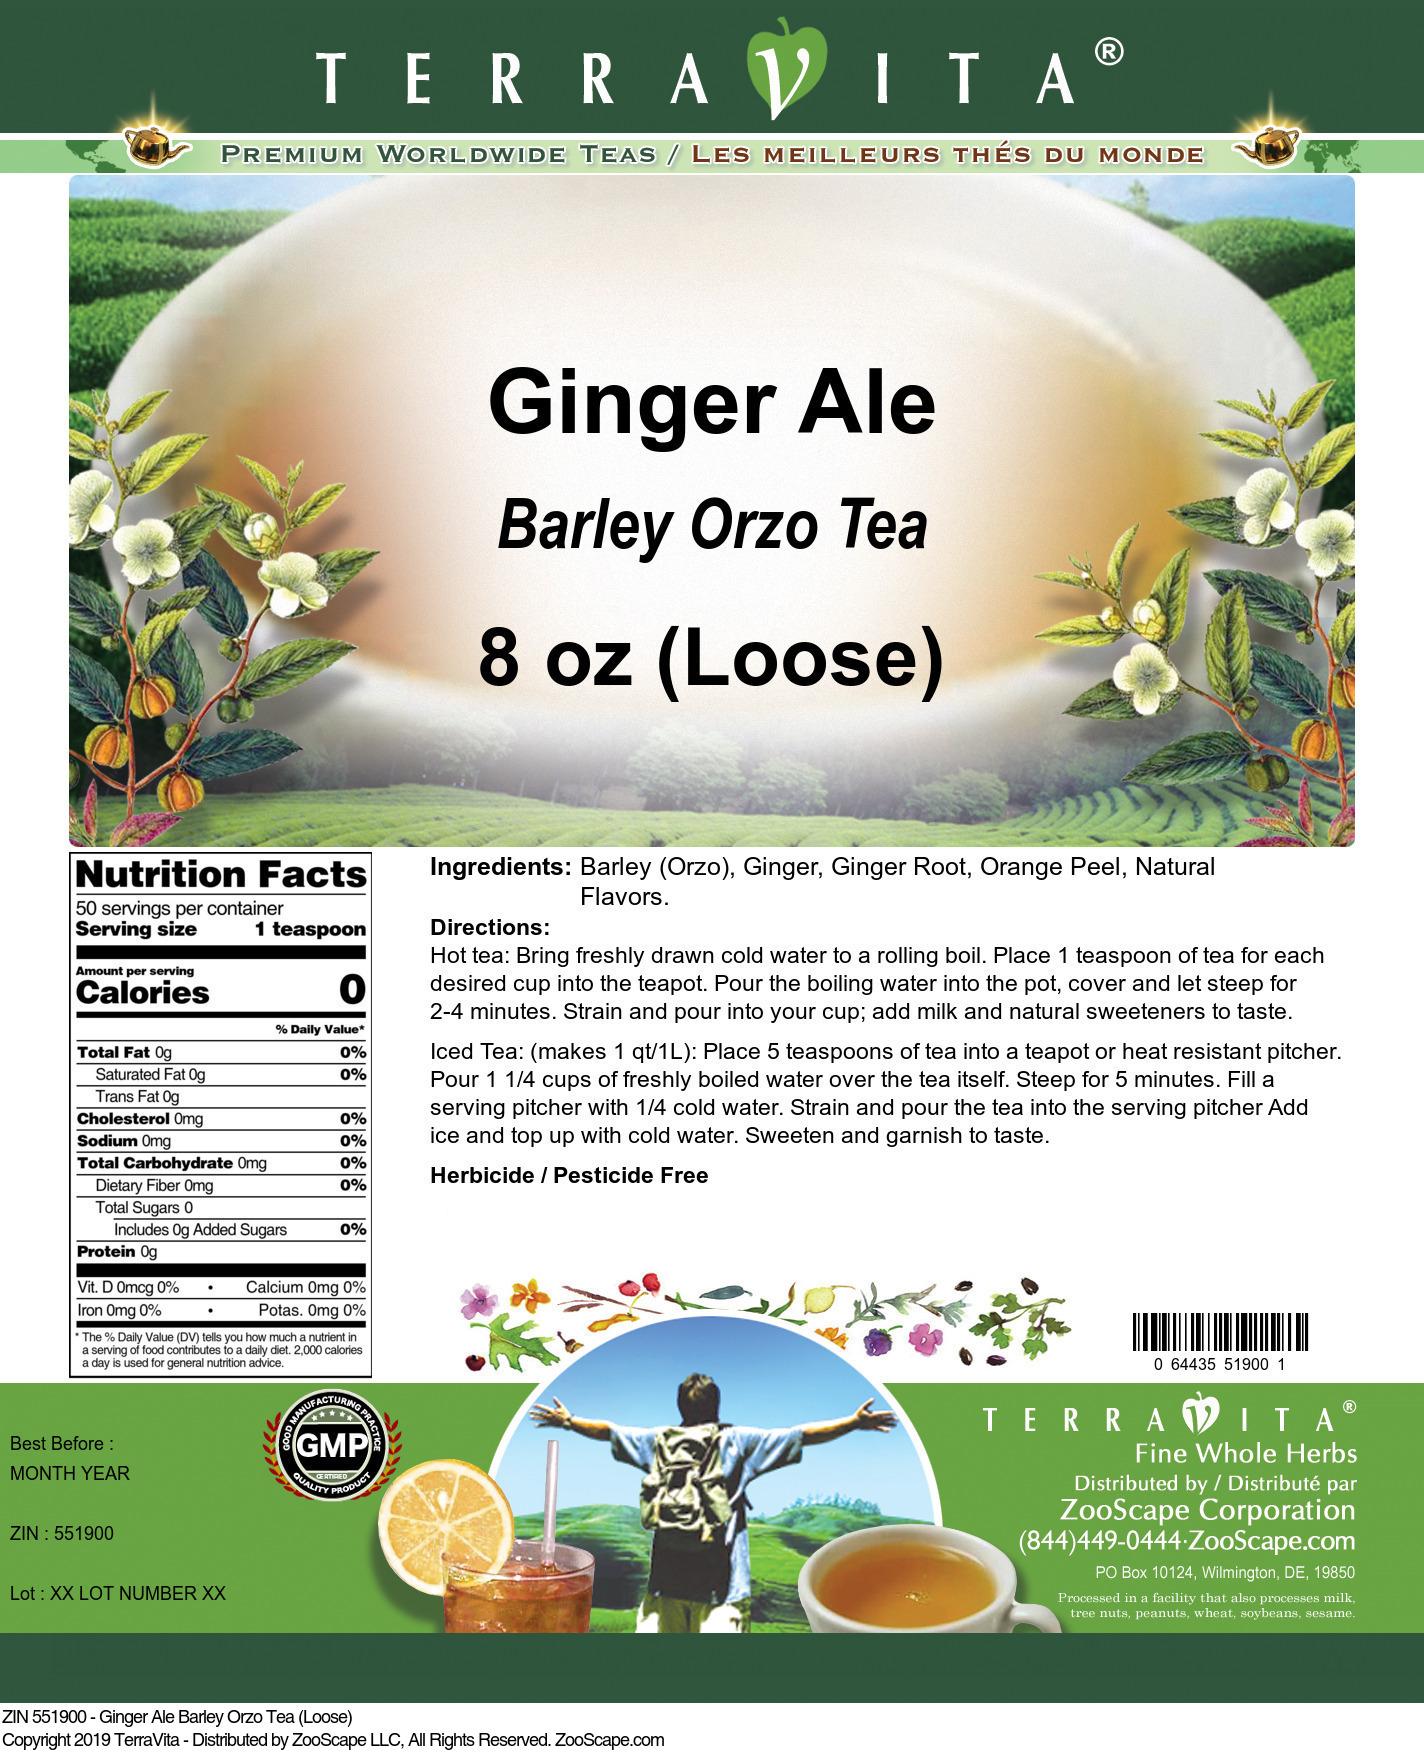 Ginger Ale Barley Orzo Tea (Loose)